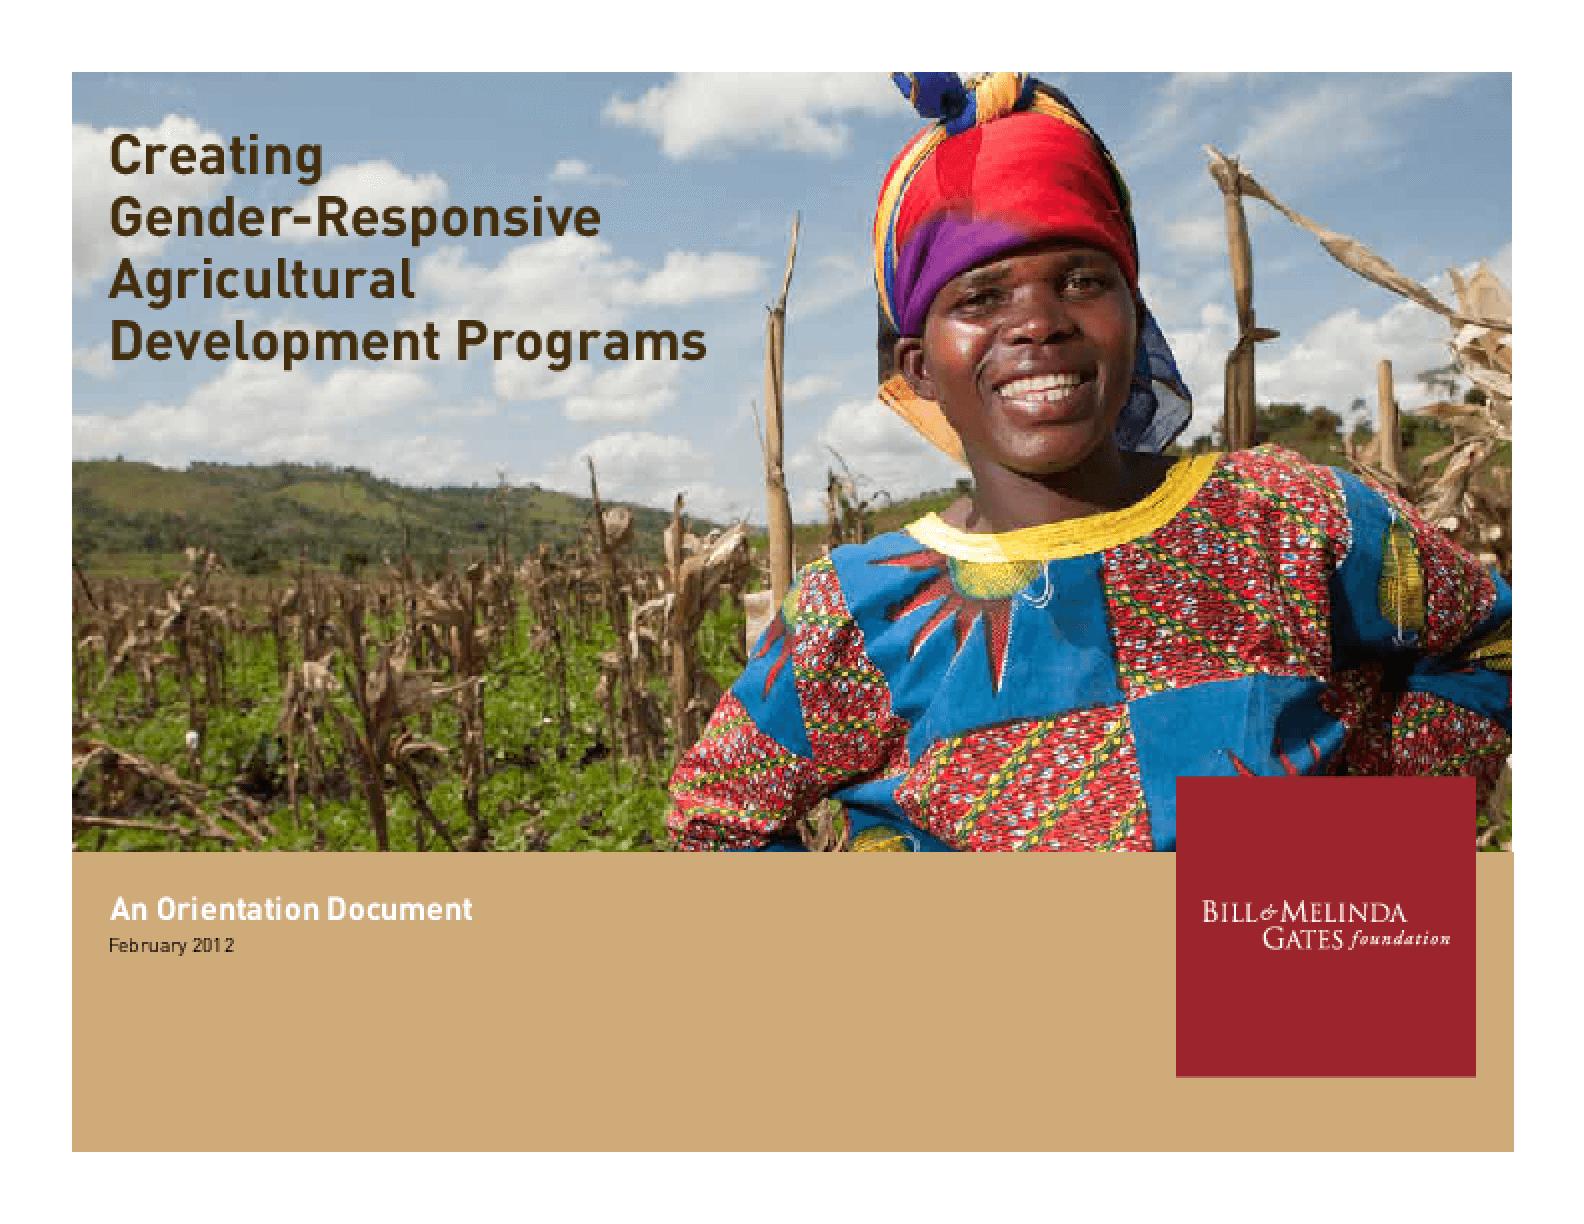 Creating Gender-Responsive Agricultural Development Programs